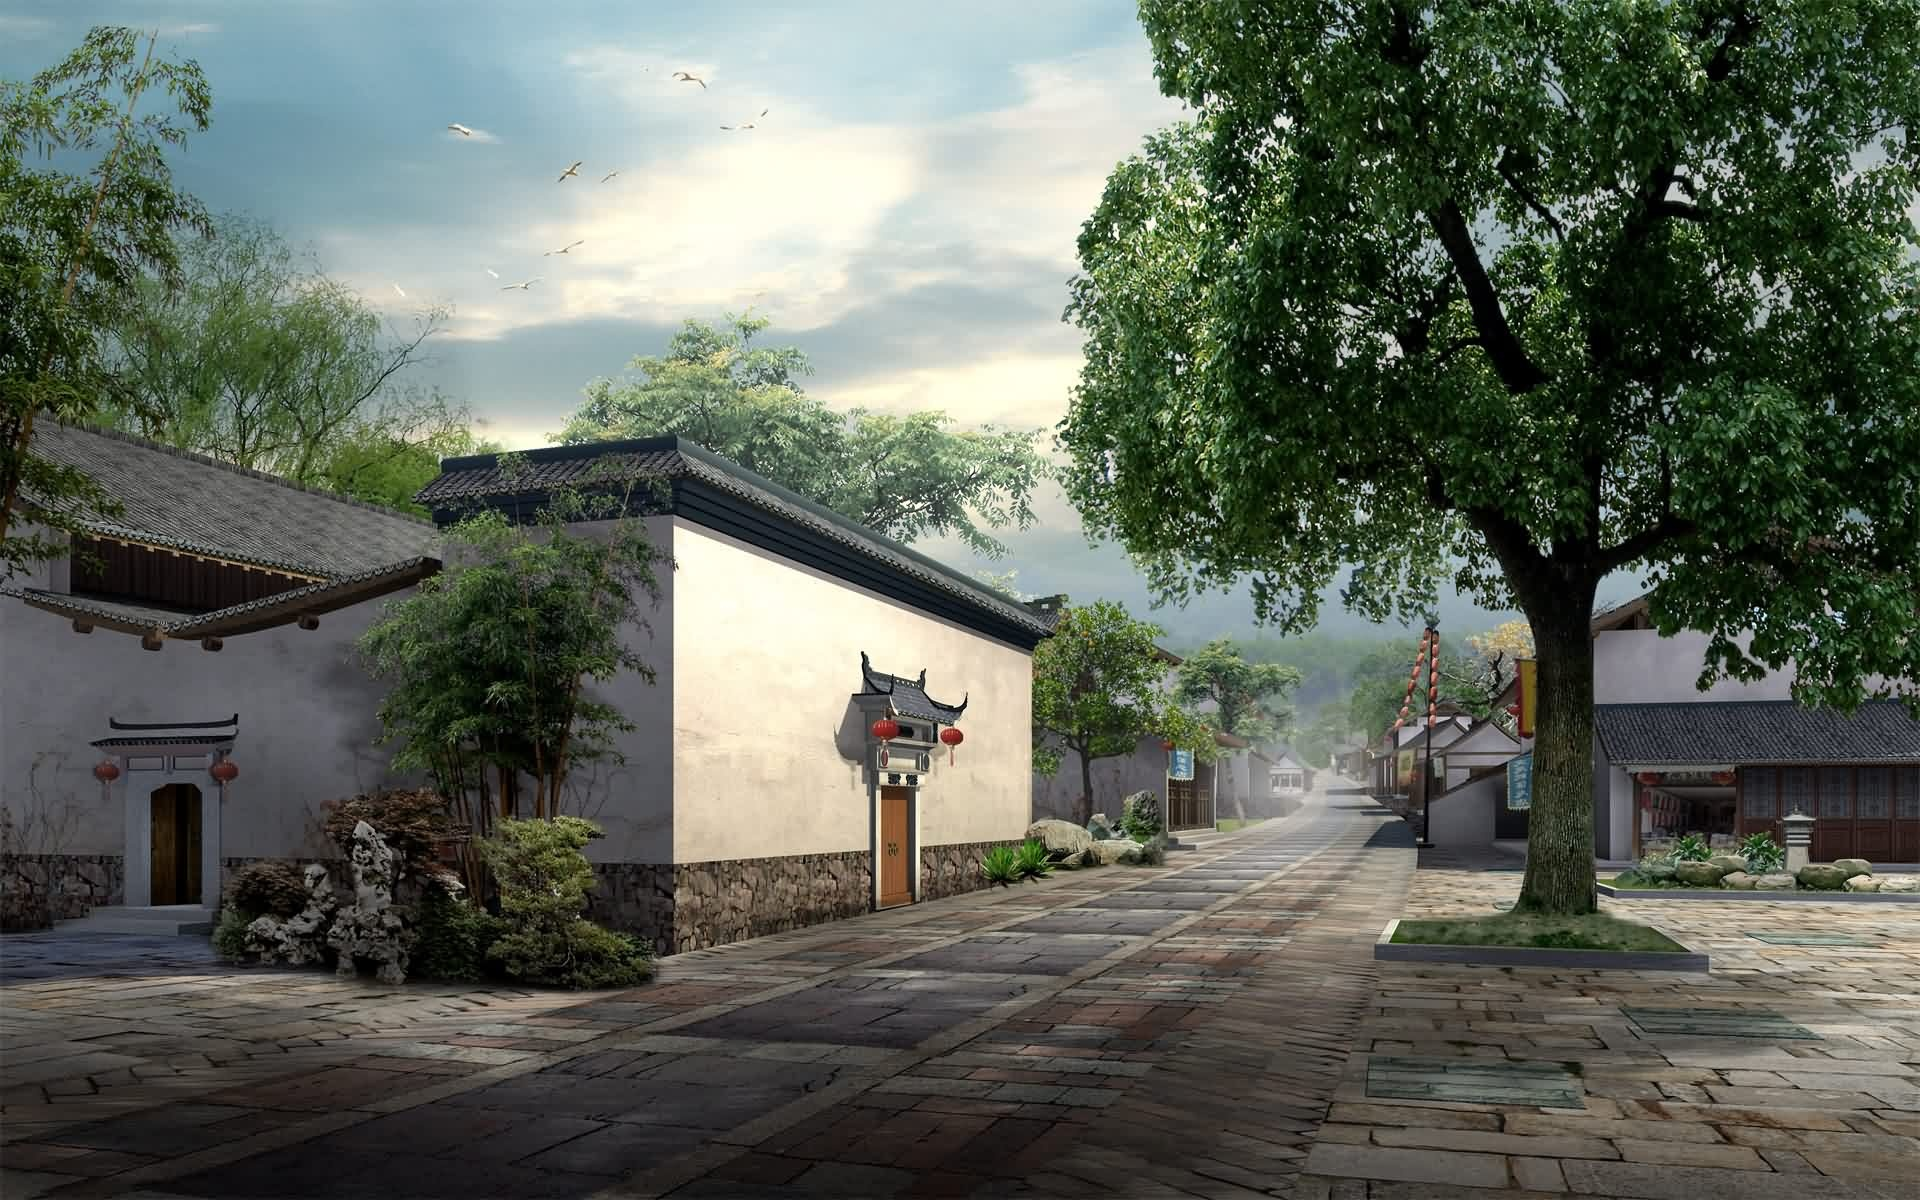 router du village wallpapers 15966 1920x1200jpg 1920x1200